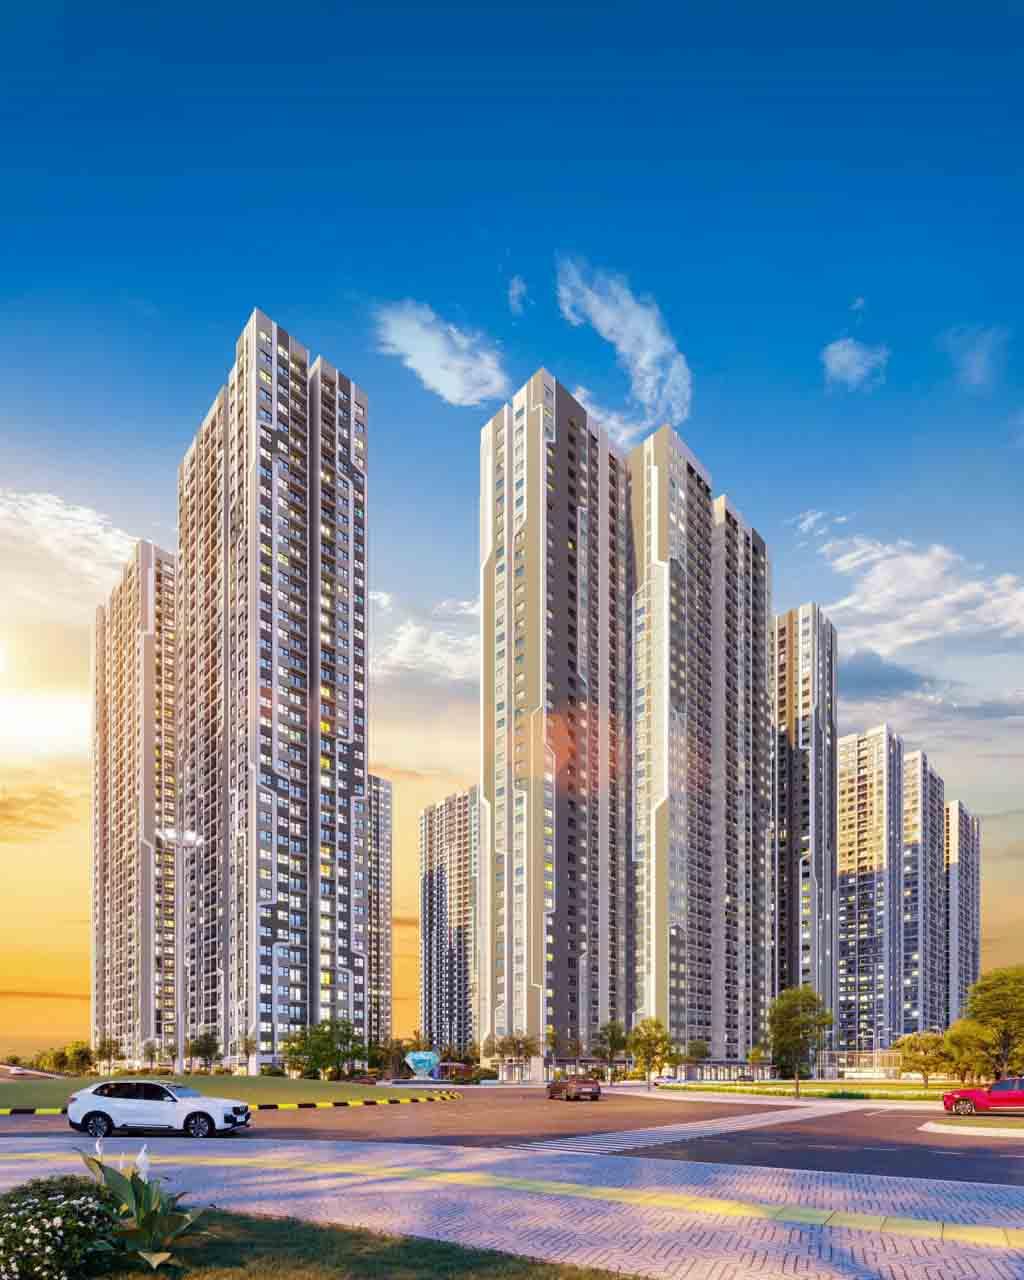 The Miami Vinhomes Smart City